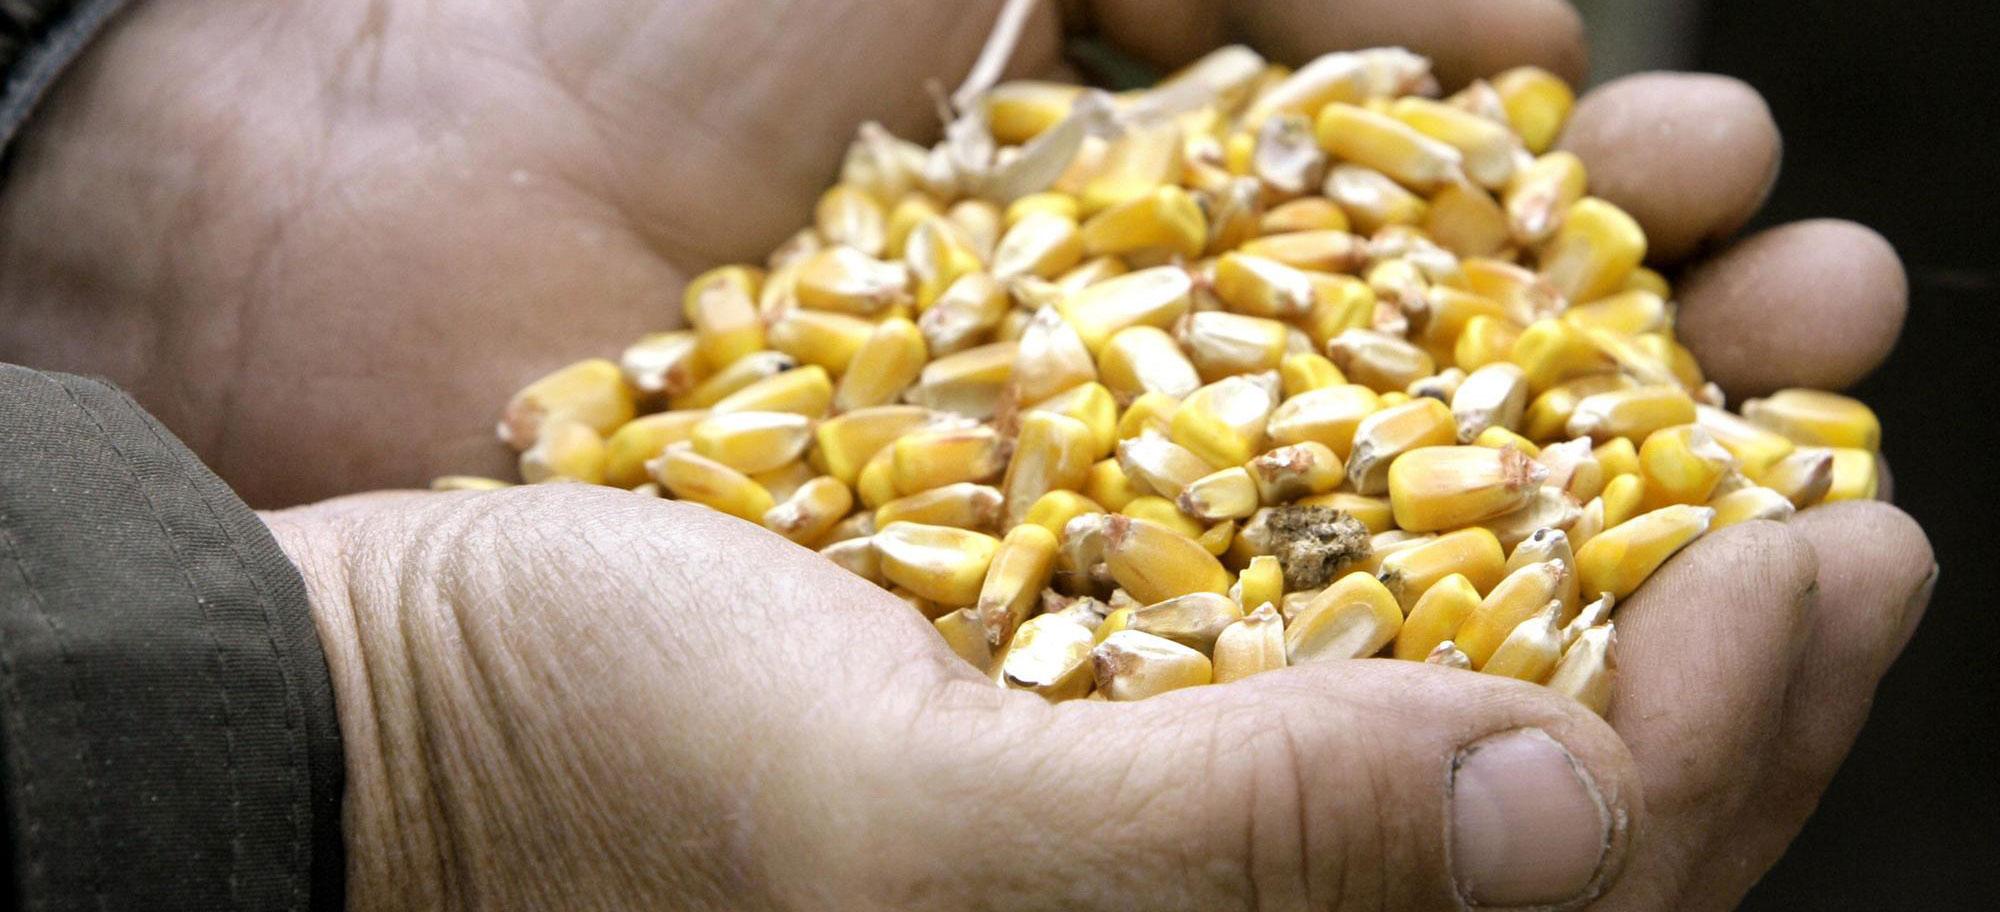 corn-grain-elevator-farming-farm-crops-markets_1757135